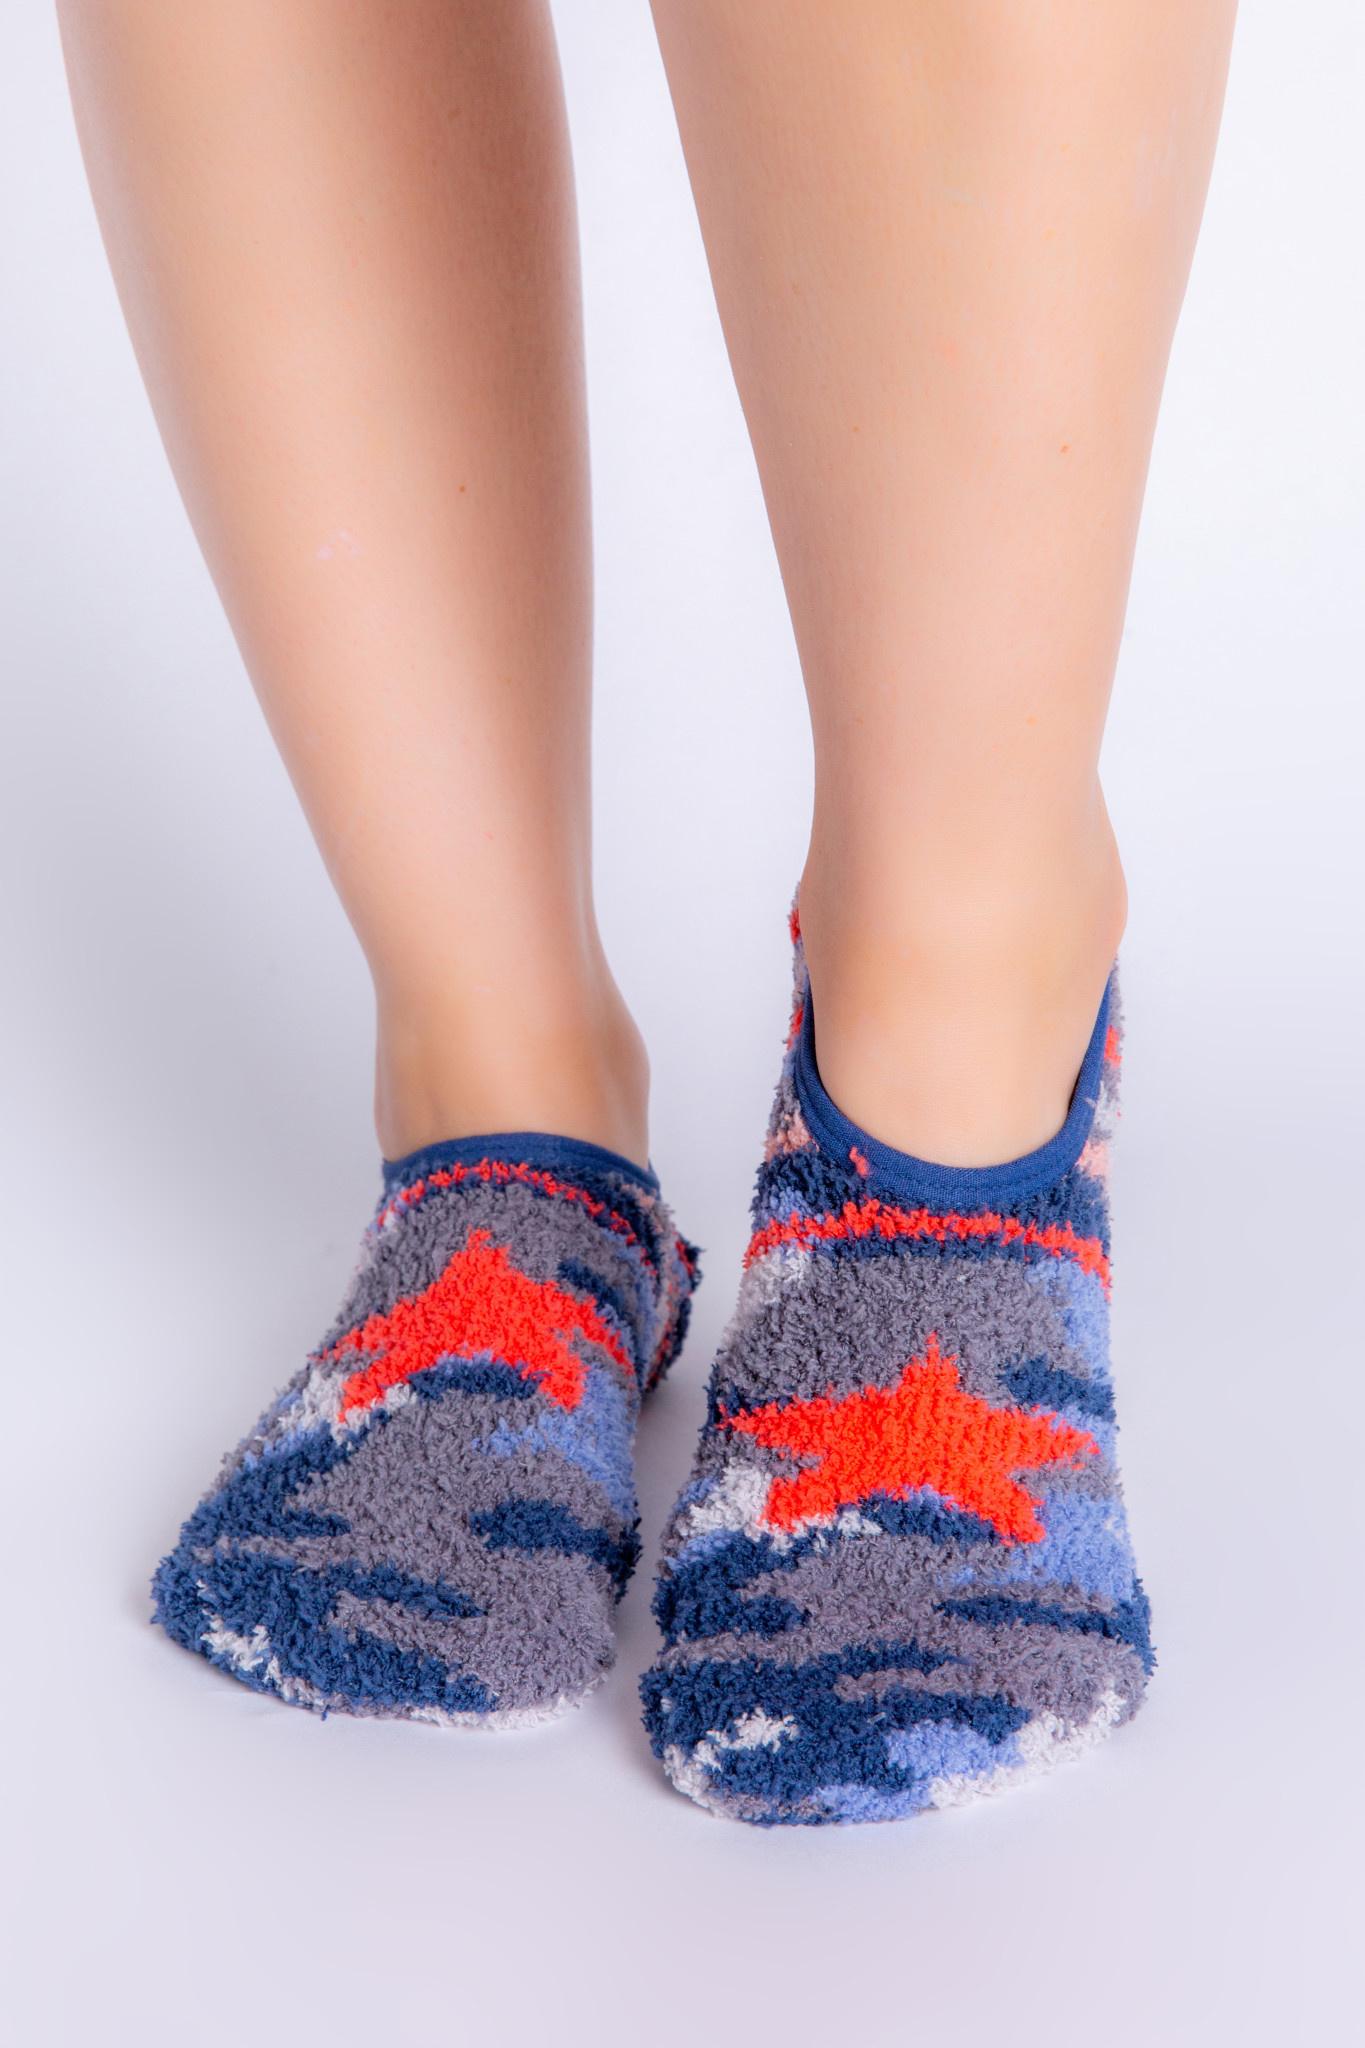 Short Fun Socks